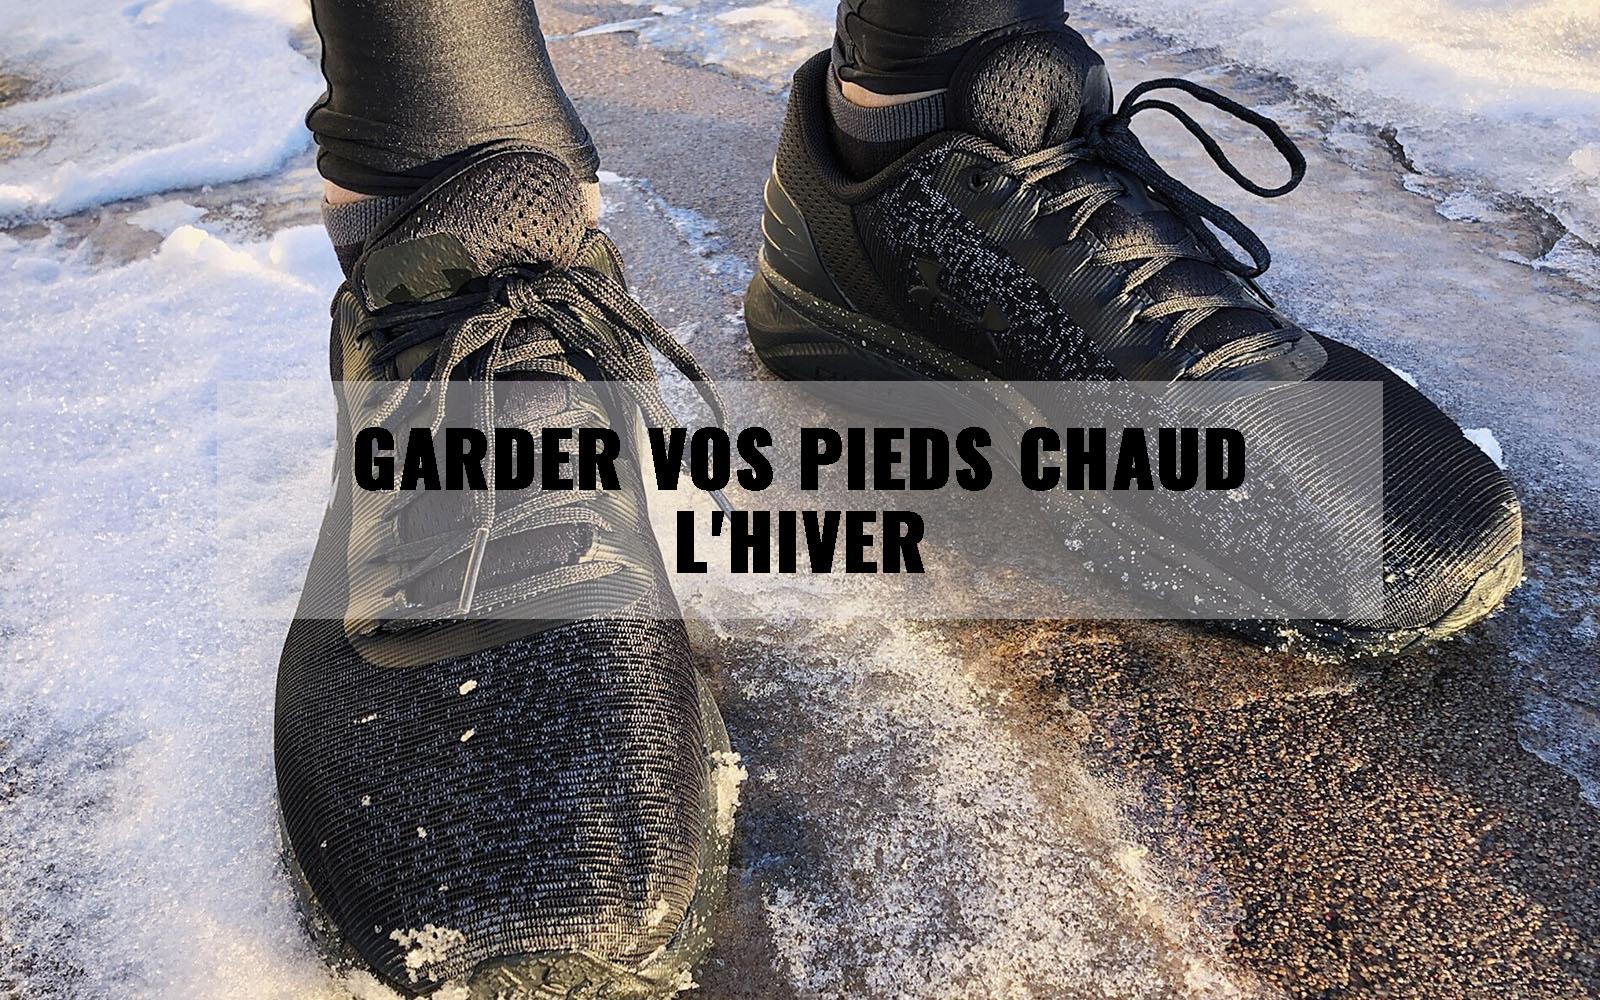 Garder vos pieds chaud l'hiver